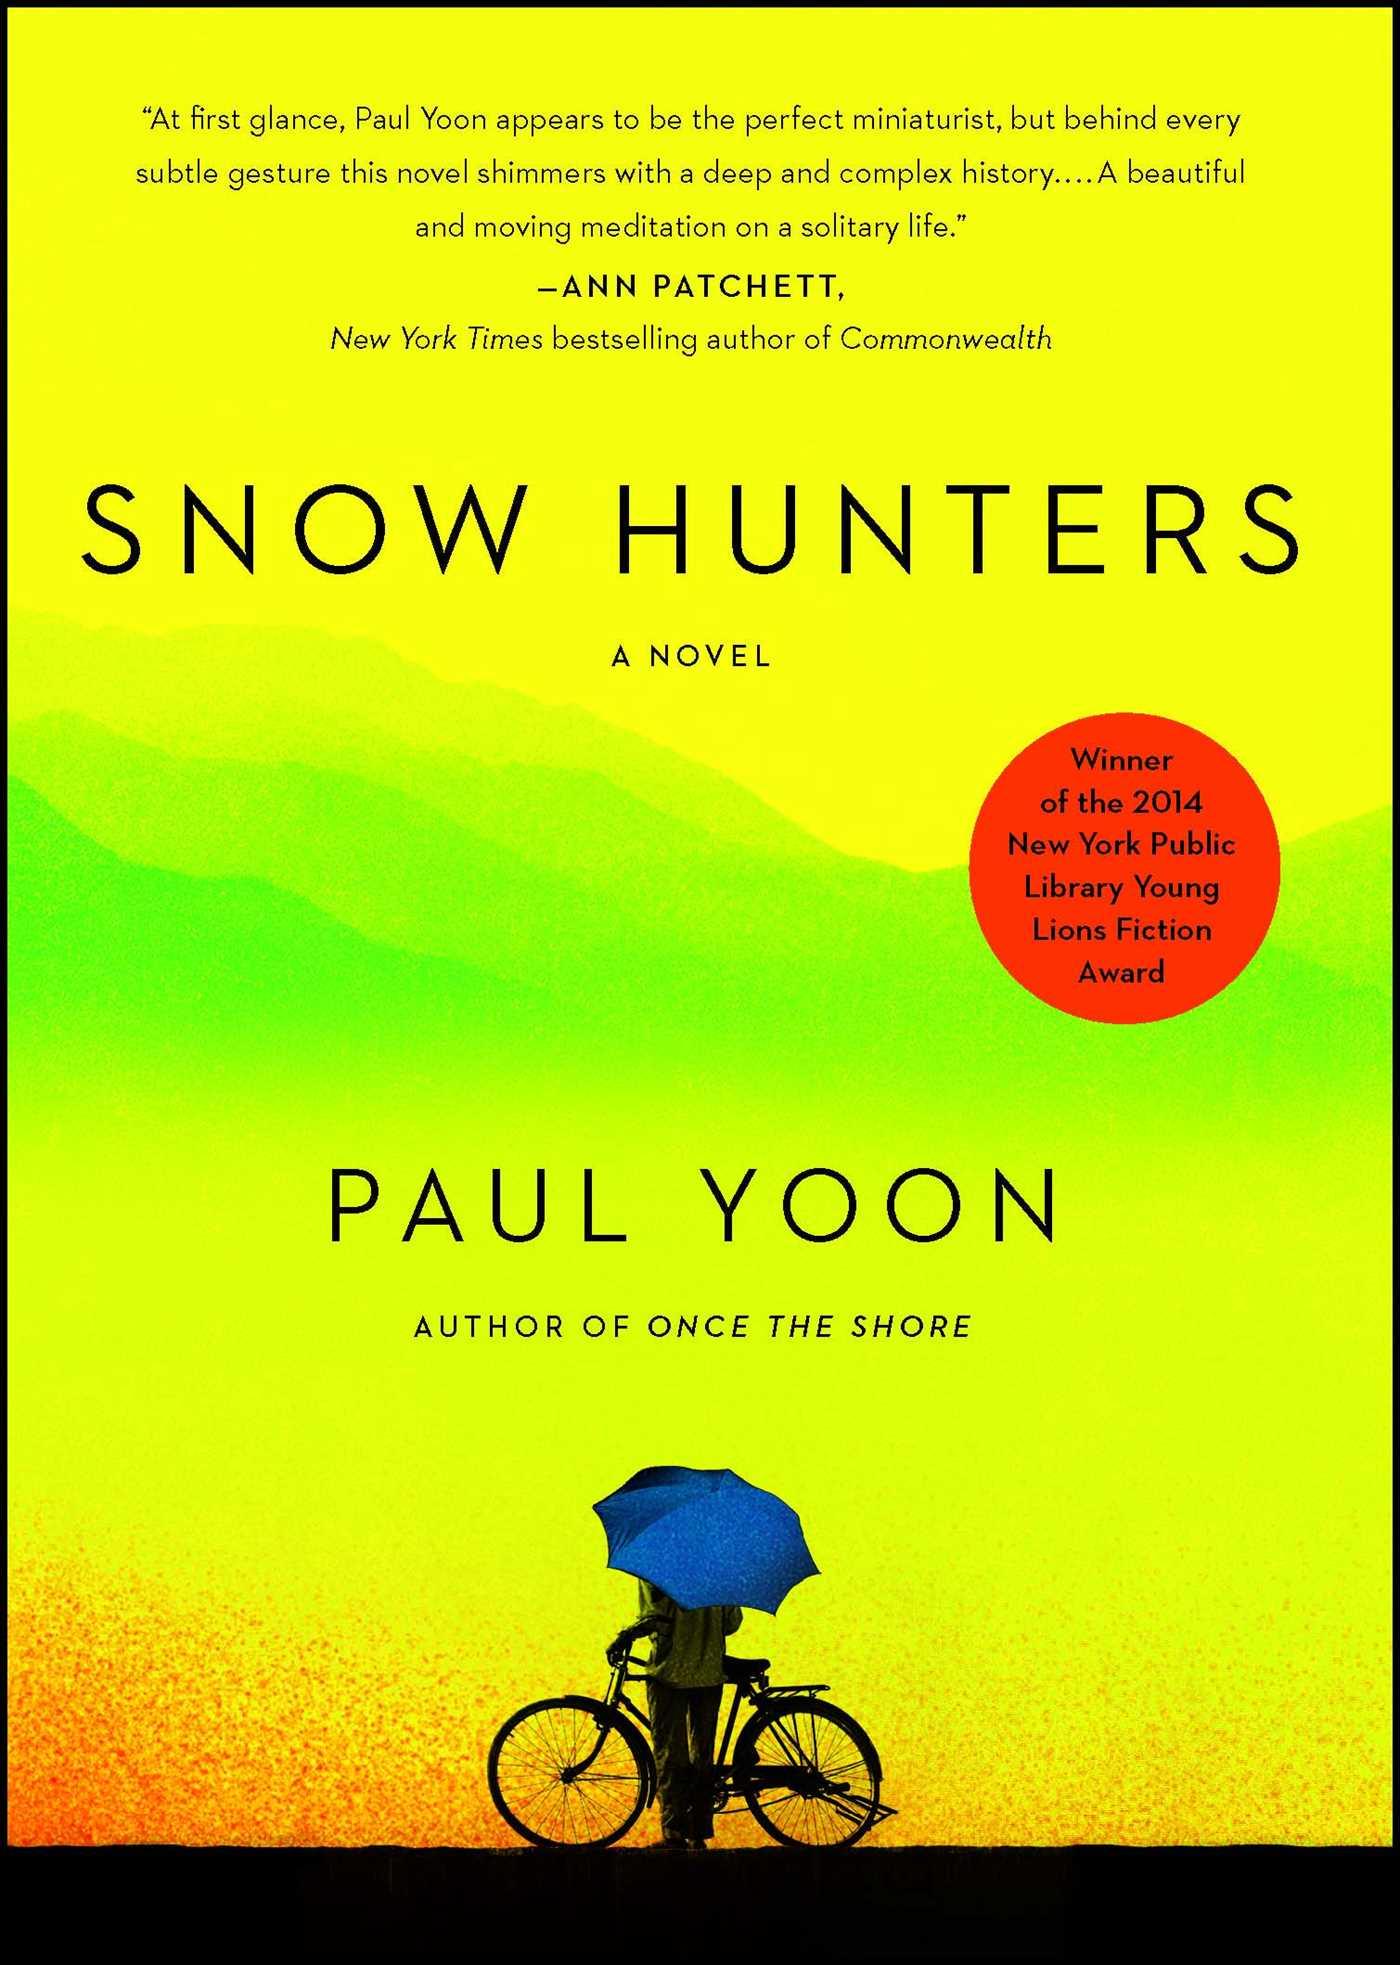 Snow hunters 9781476714837 hr